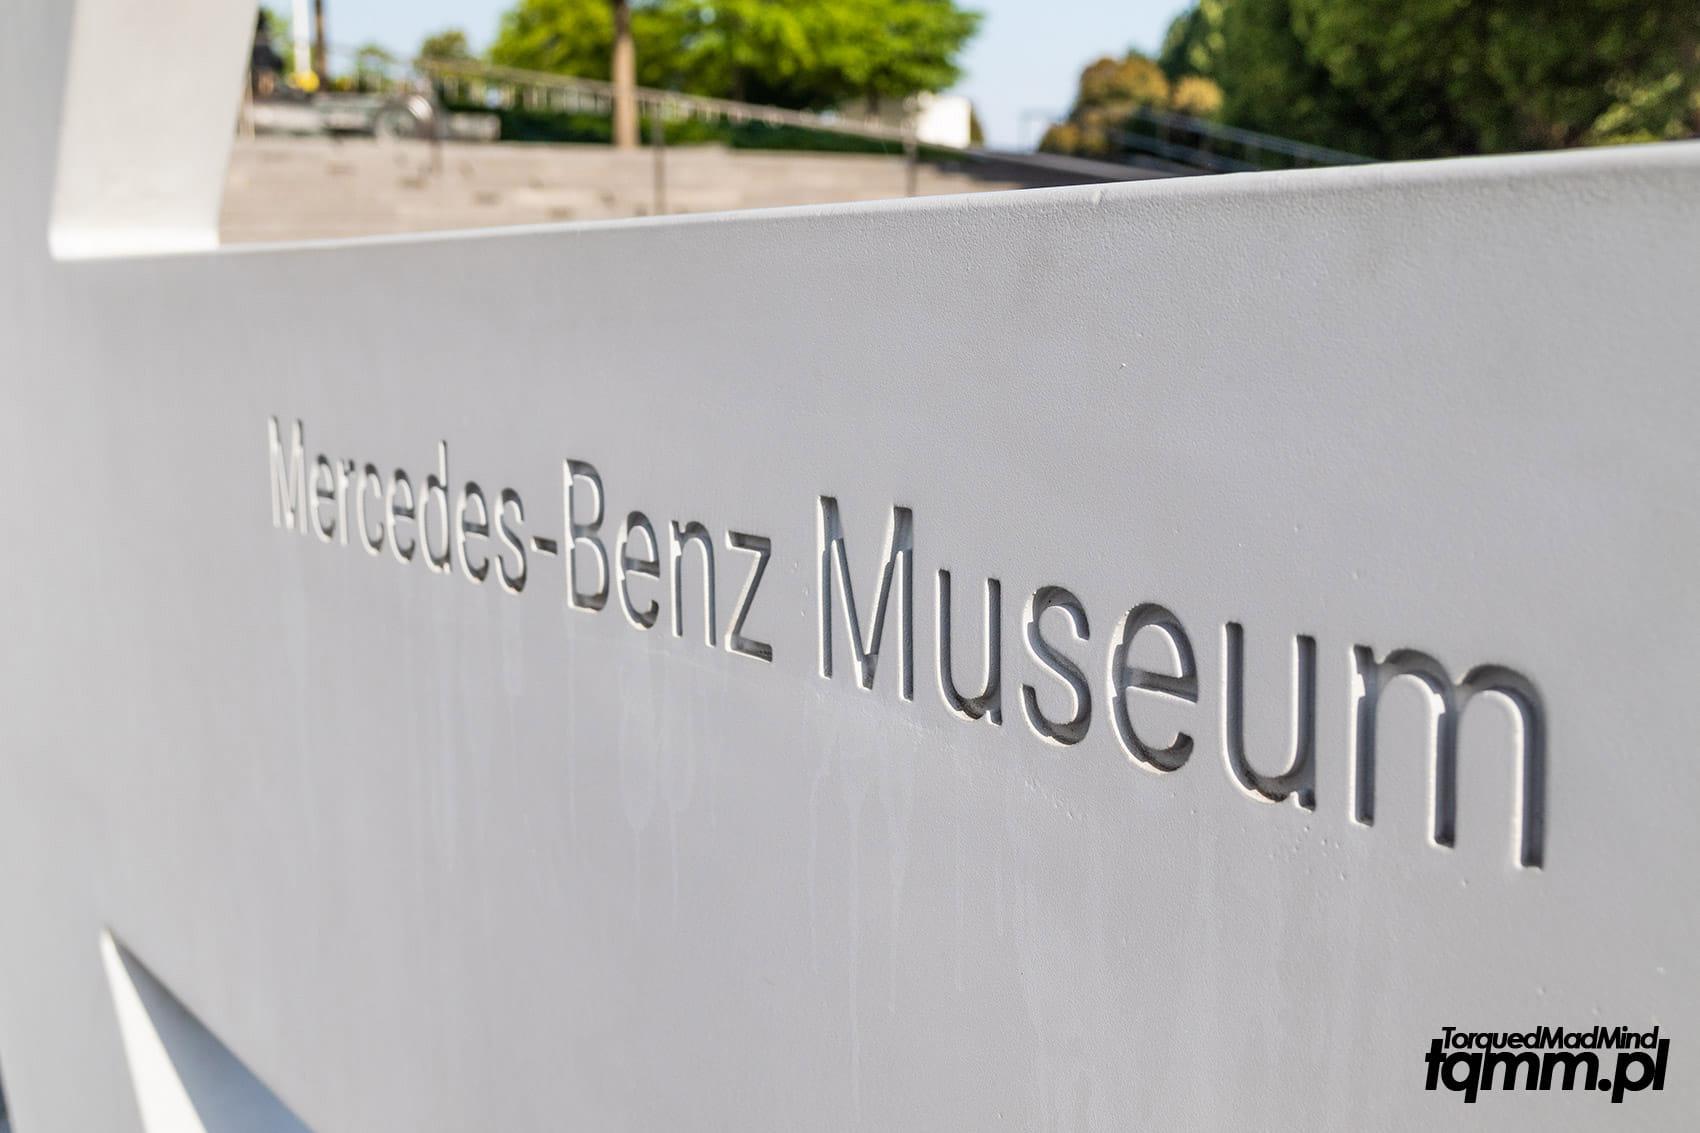 Fotki #111: Mercedes-Benz Museum